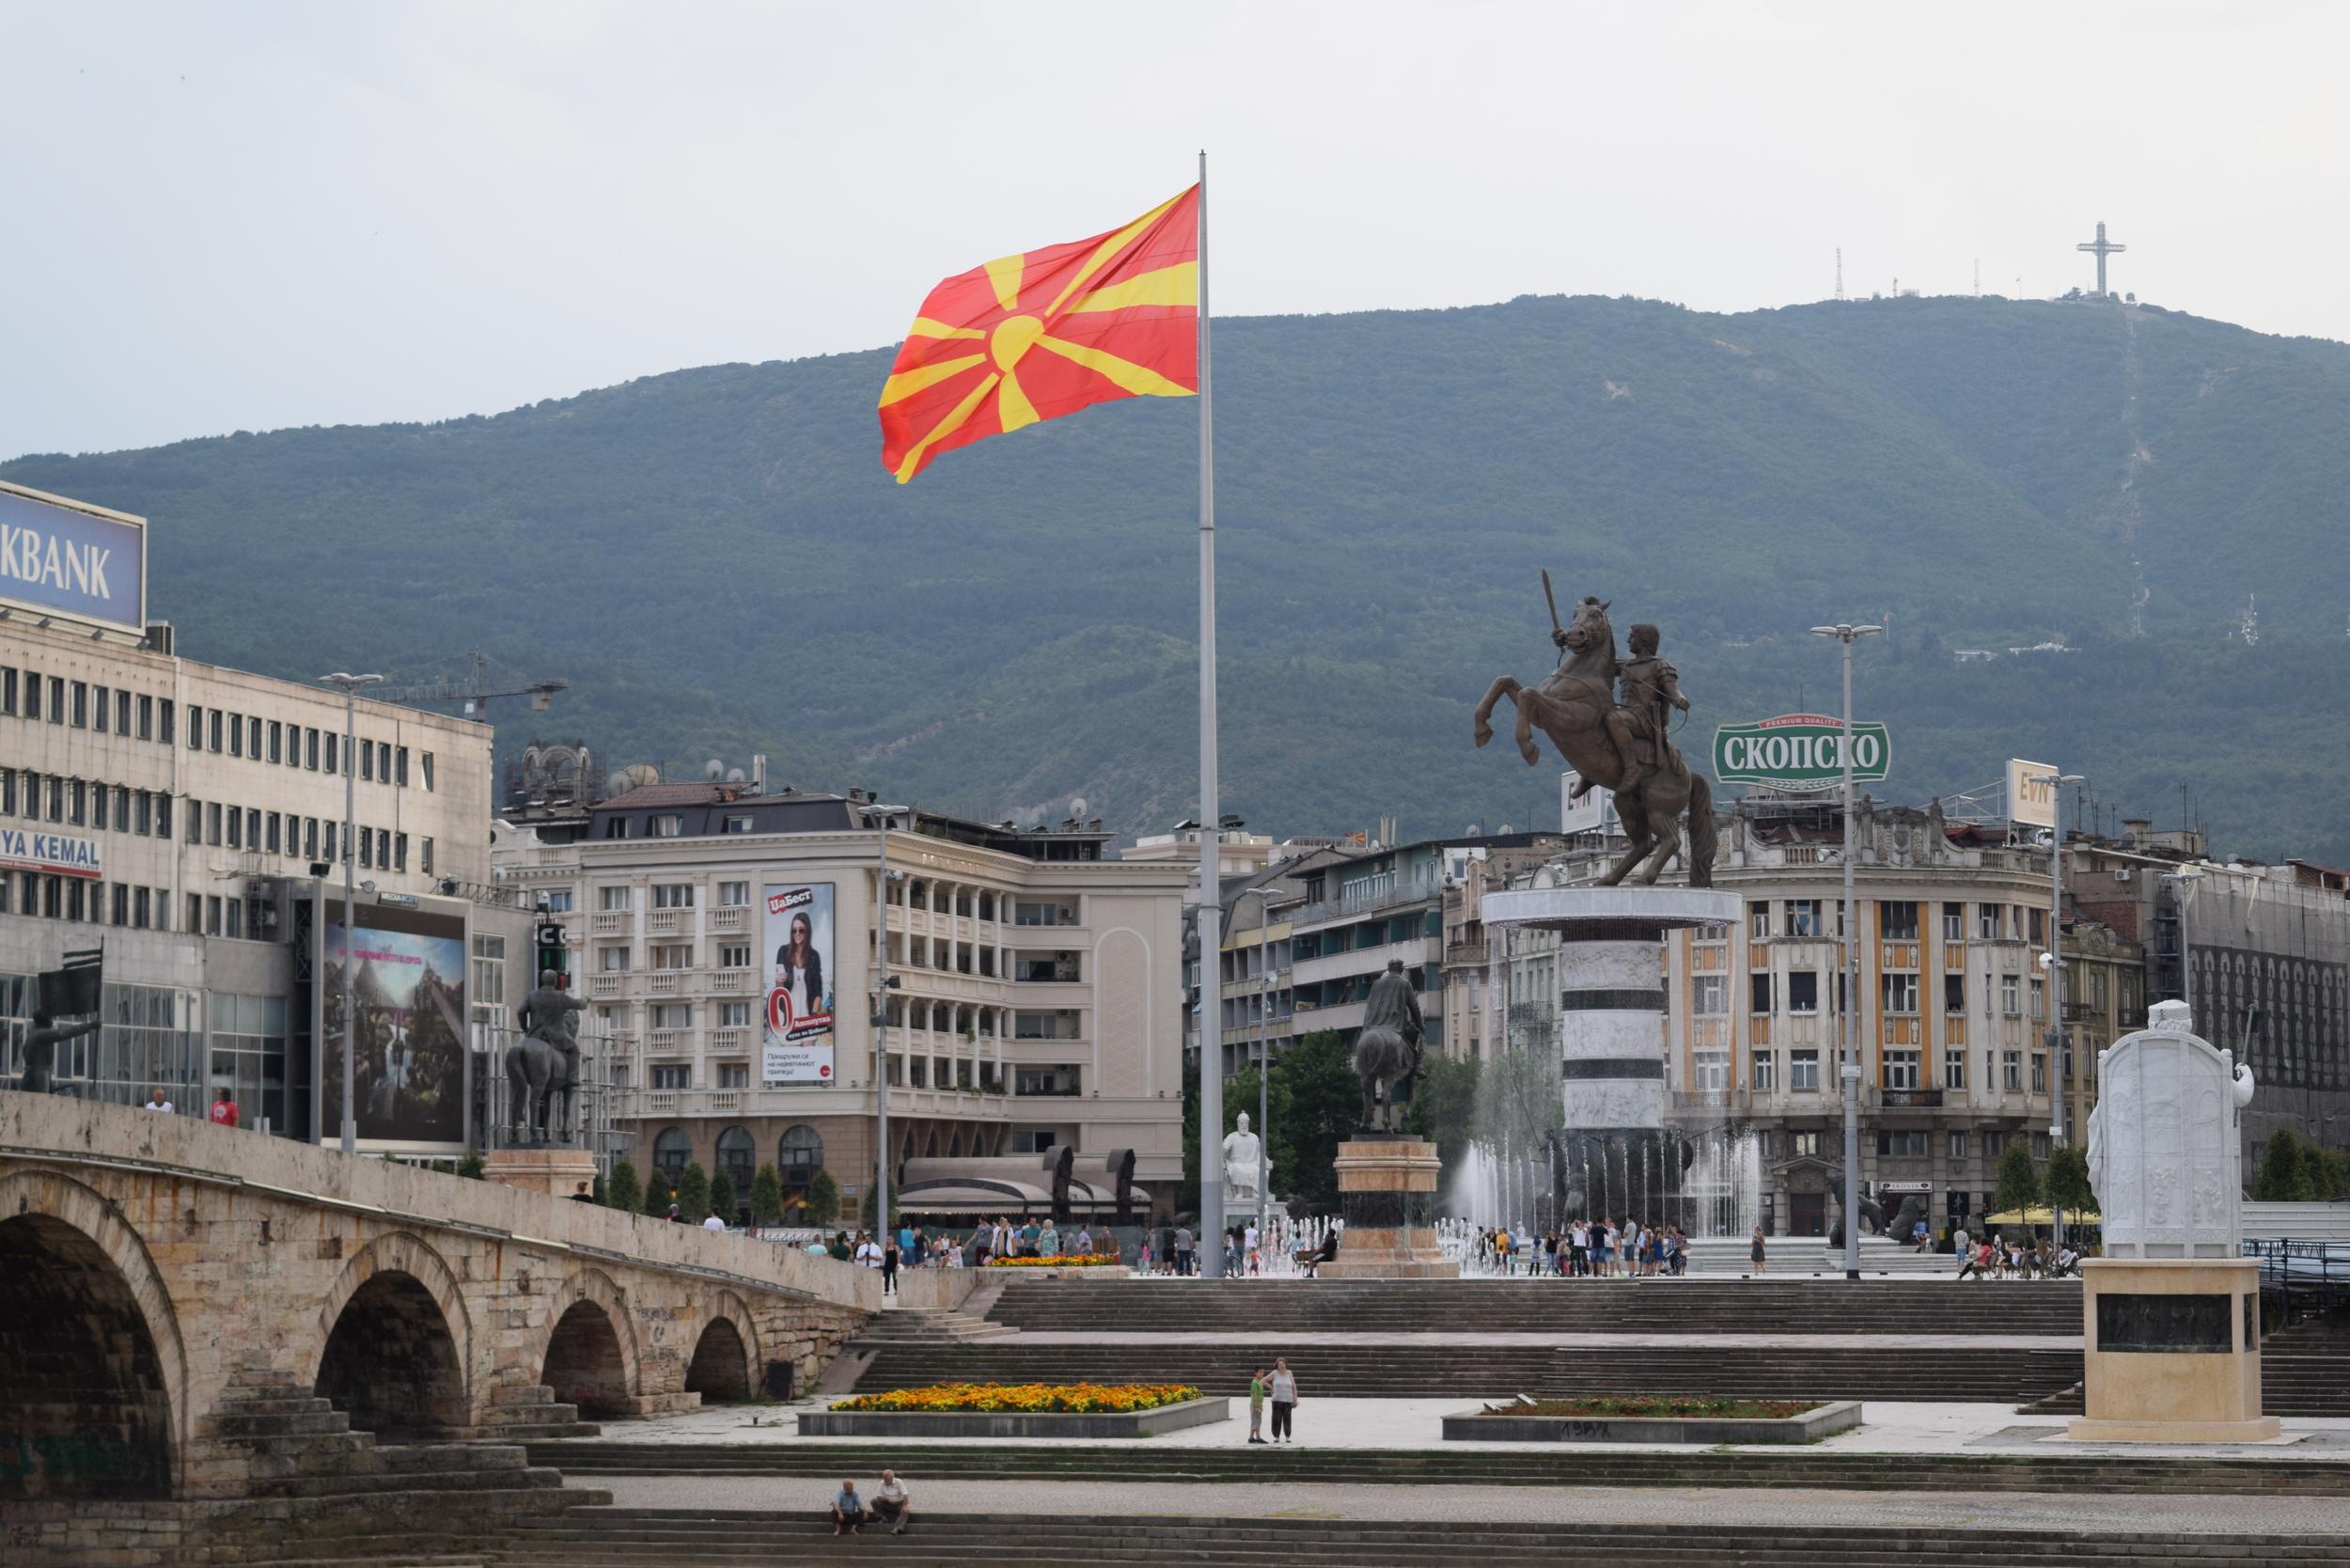 Skopje city center